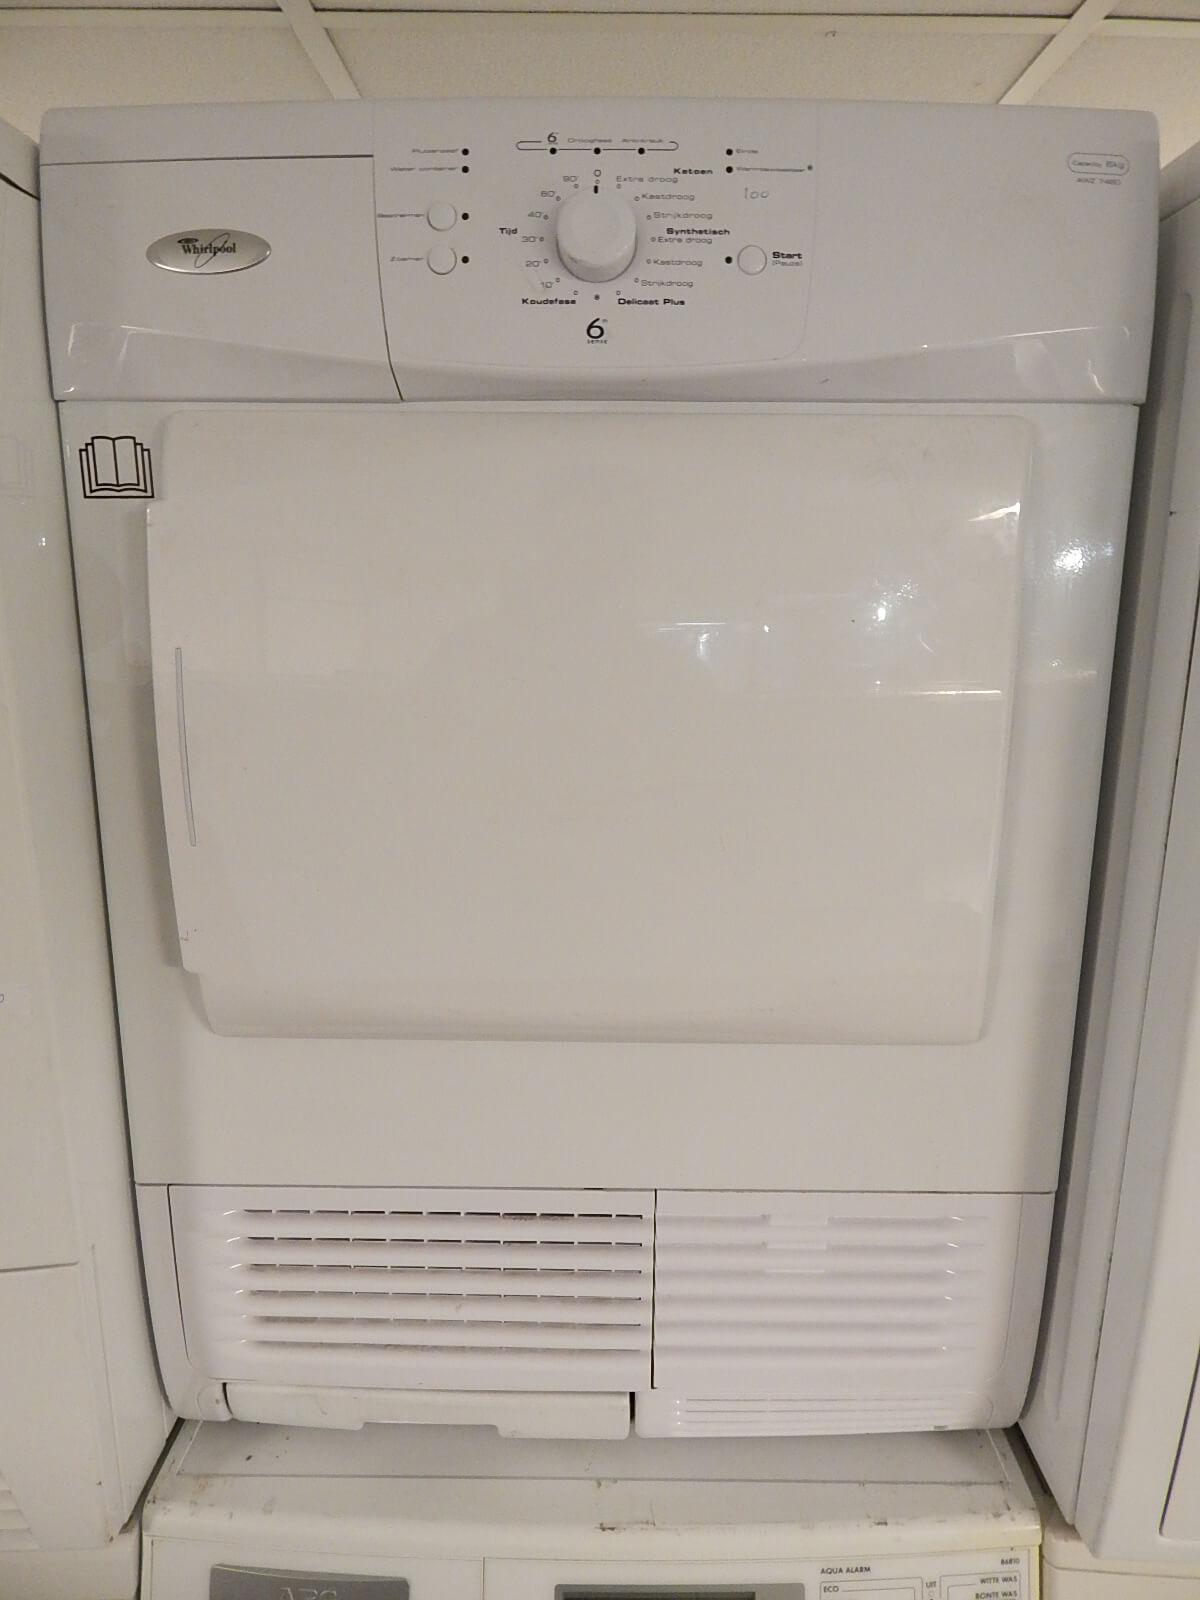 gebruikte Whirlpool wasdroger